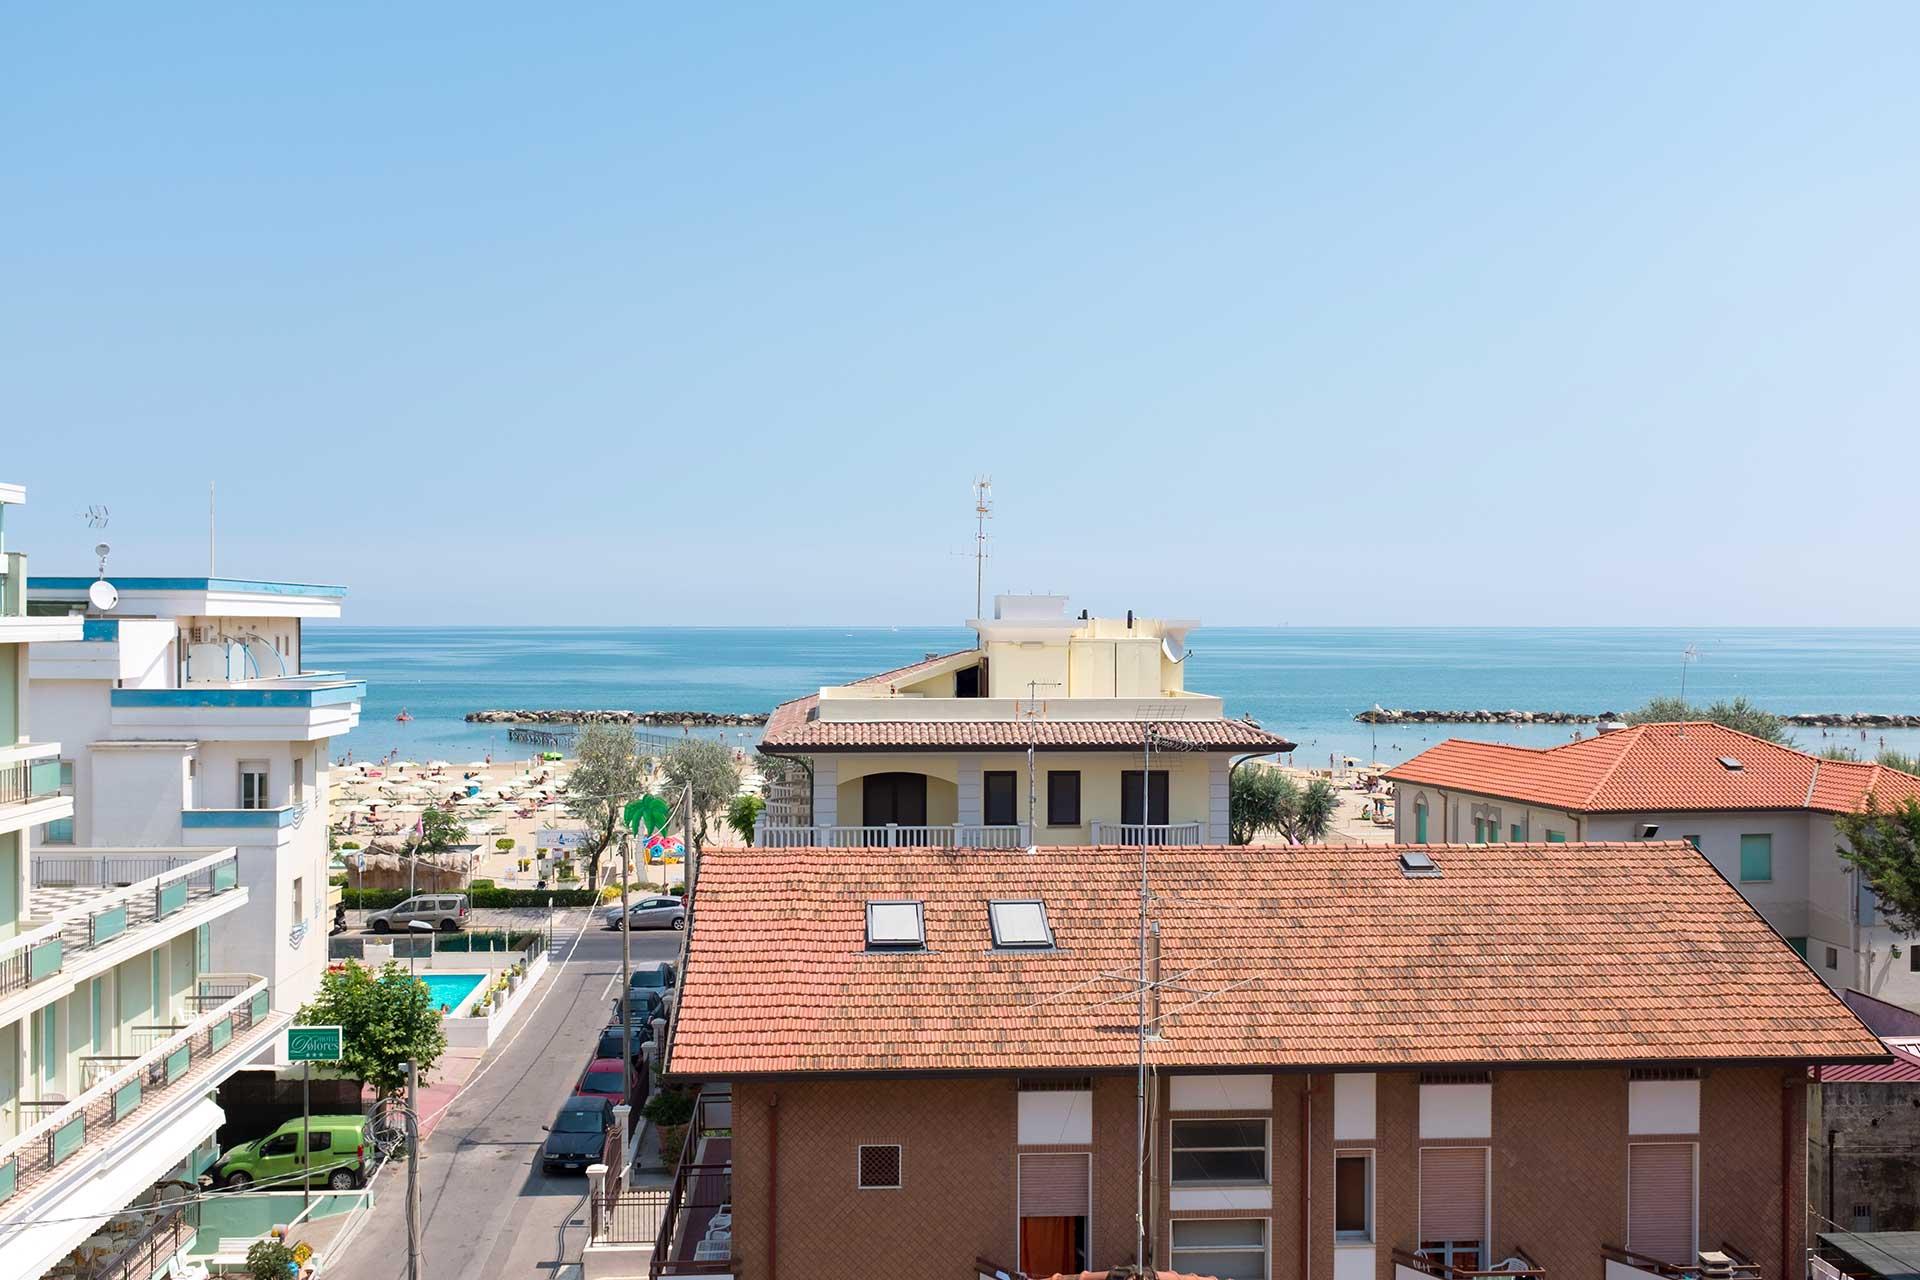 Hotel Kariba, Rimini - výhled na moře